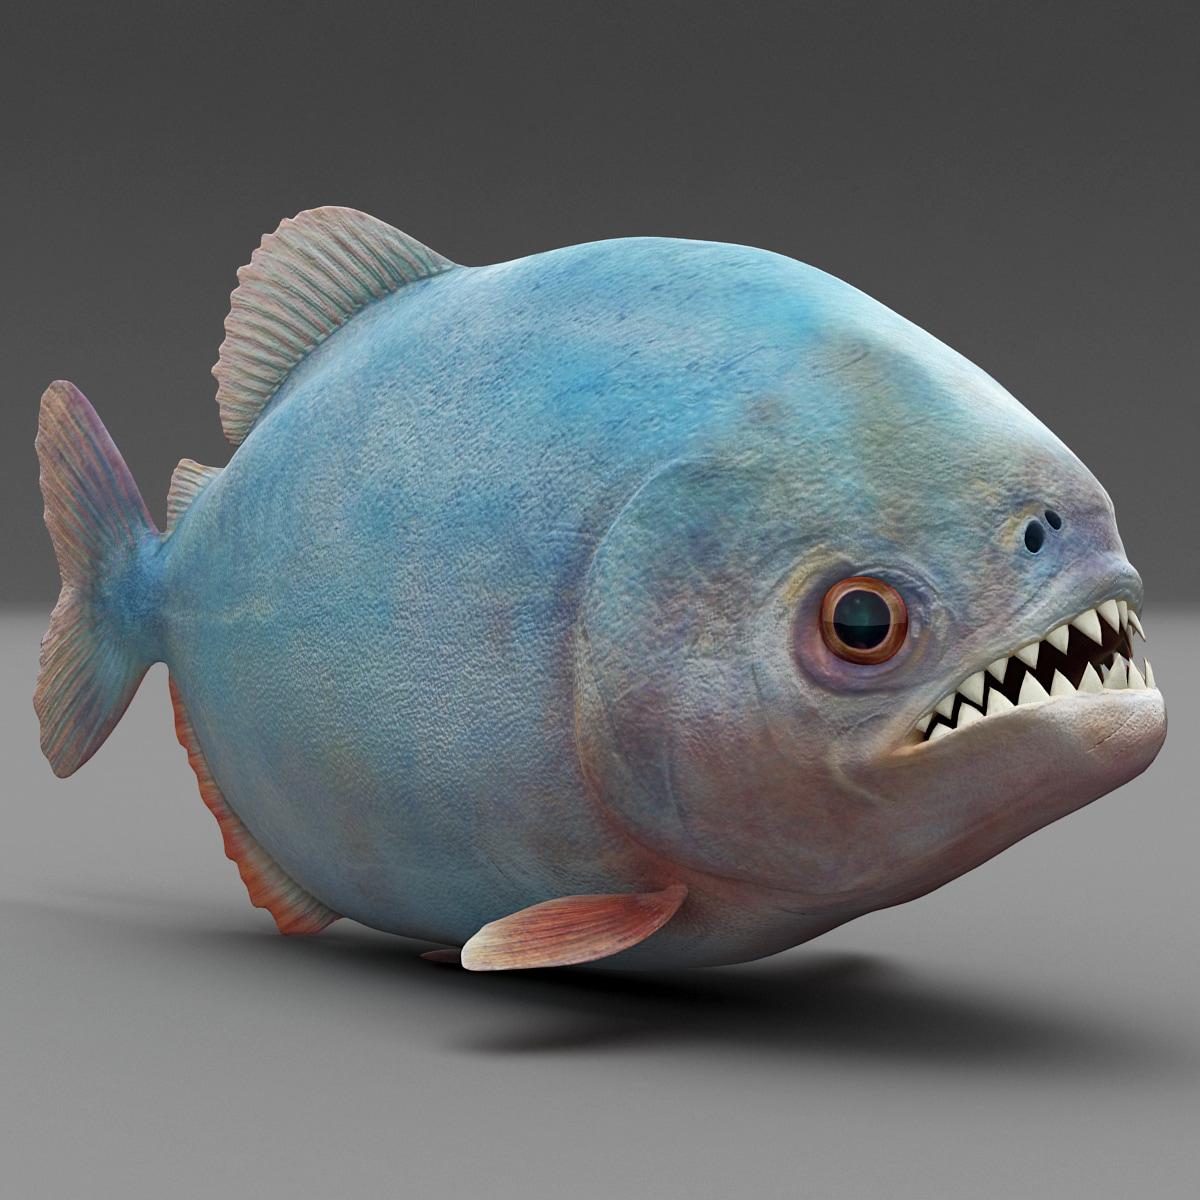 piranha_0001.jpg